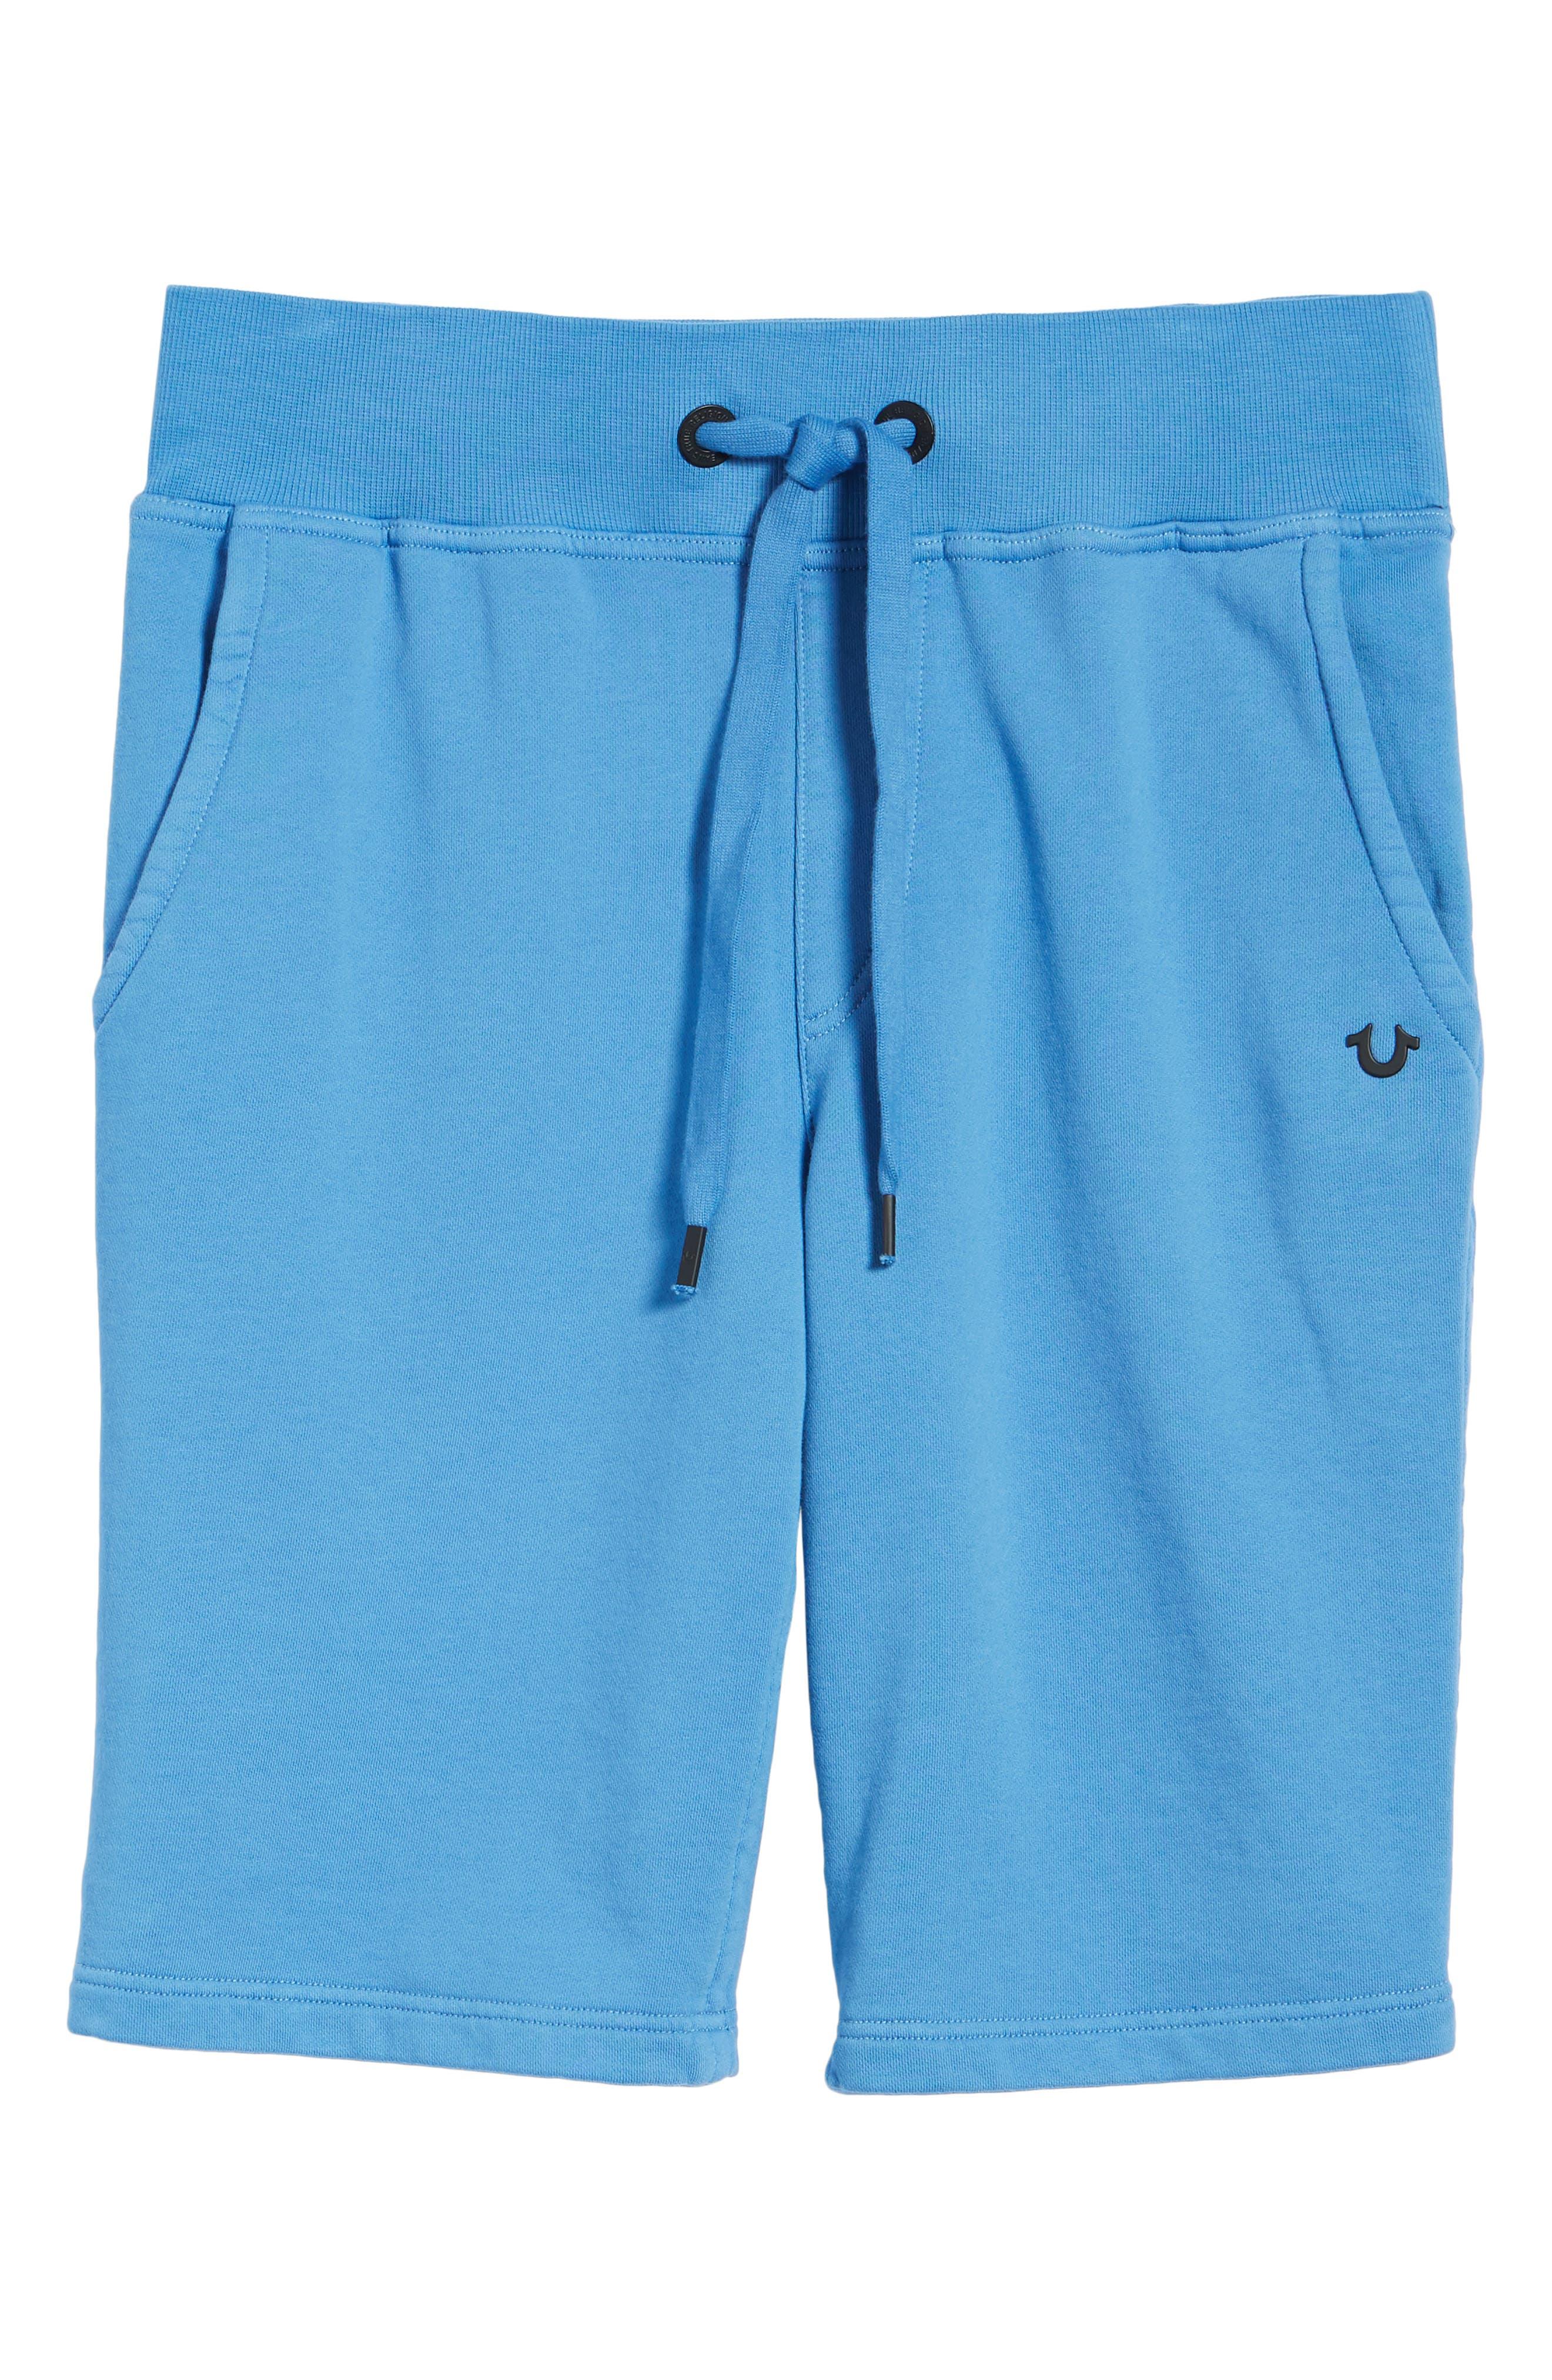 Core Shorts,                             Alternate thumbnail 6, color,                             DIGITAL BLUE